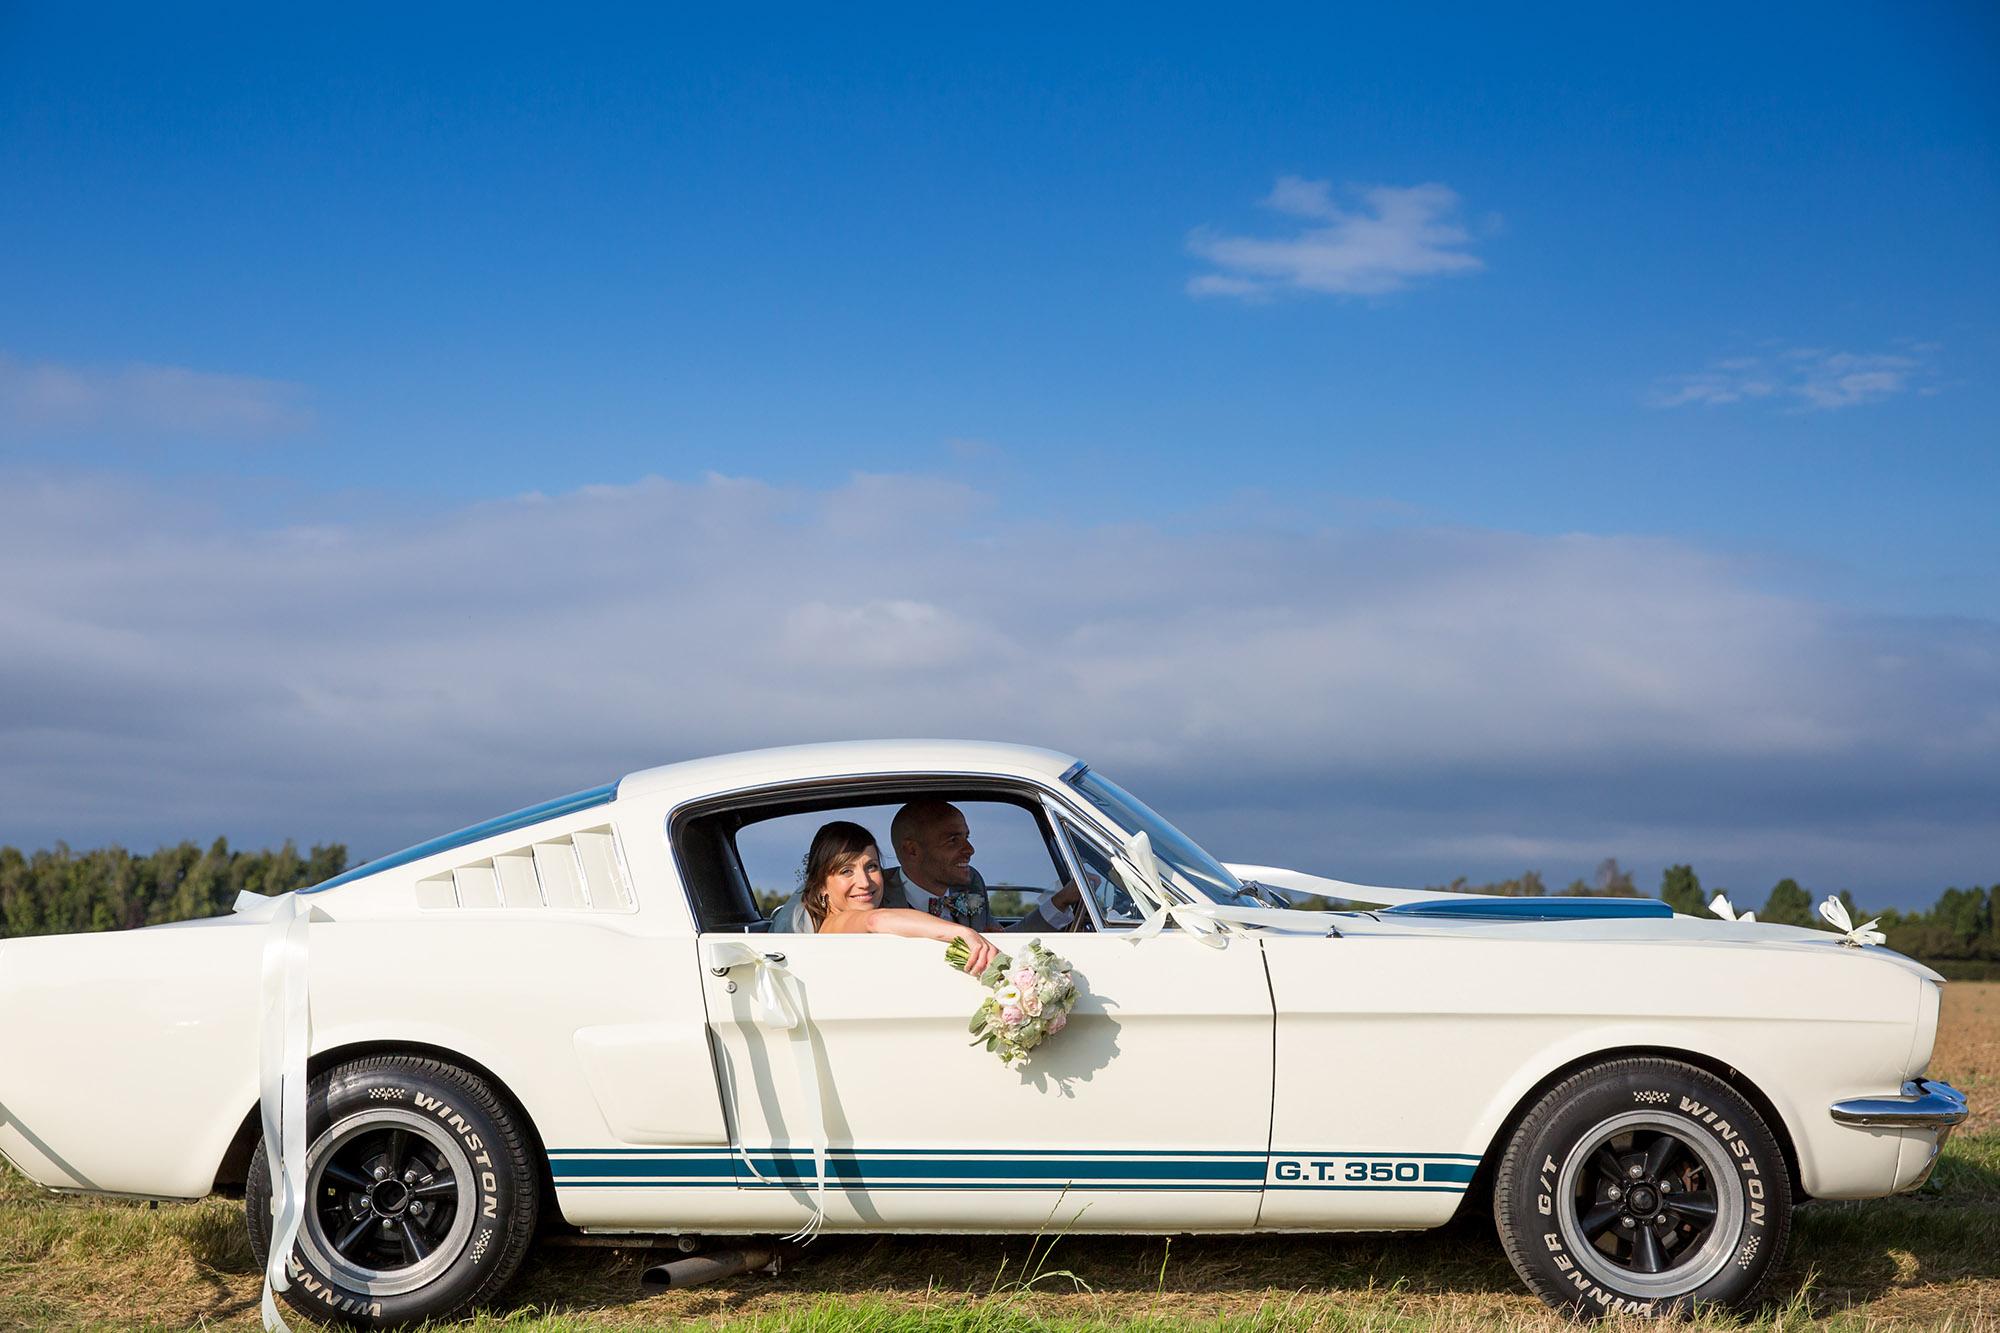 julia-toms-wedding-photographer-west-sussex-003.jpg